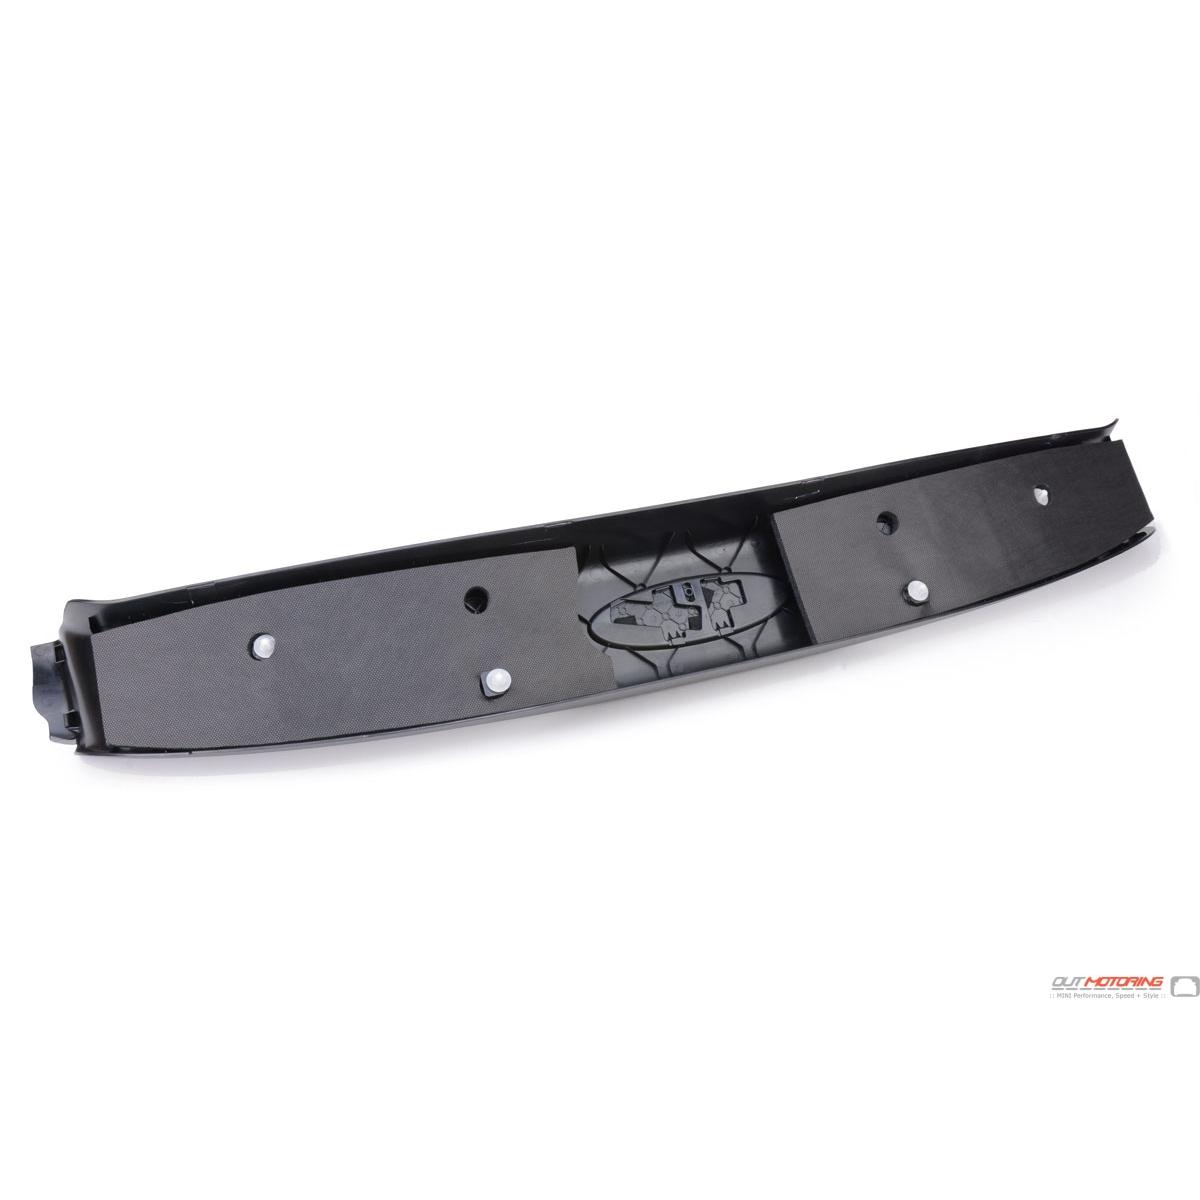 54342758084 MINI Cooper Replacement Rear Tray Trim